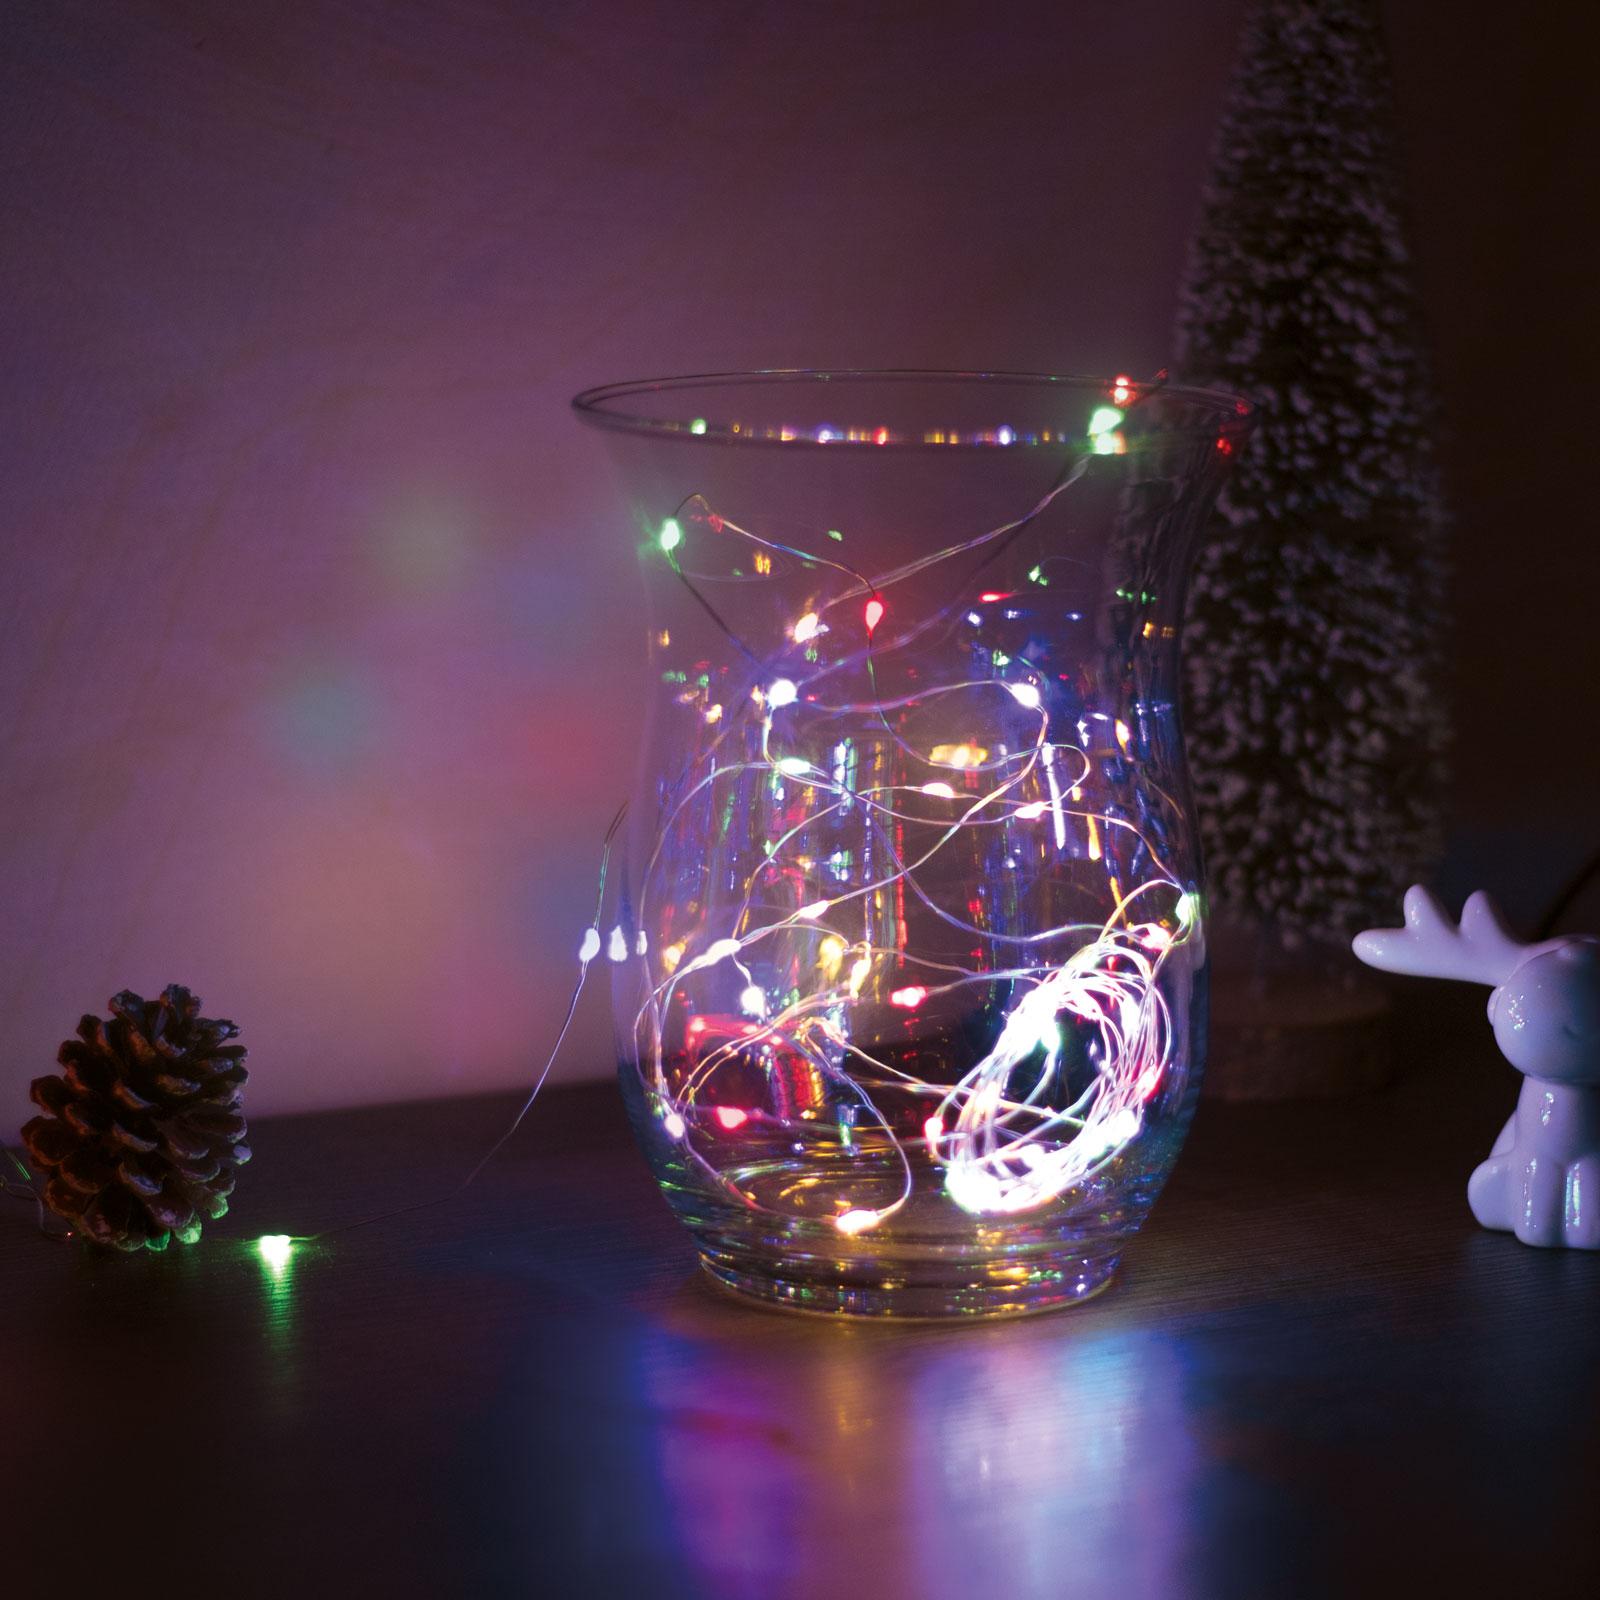 Sir de lumini LED de Craciun - 5 m -50 LED - multicolor, 3xAA